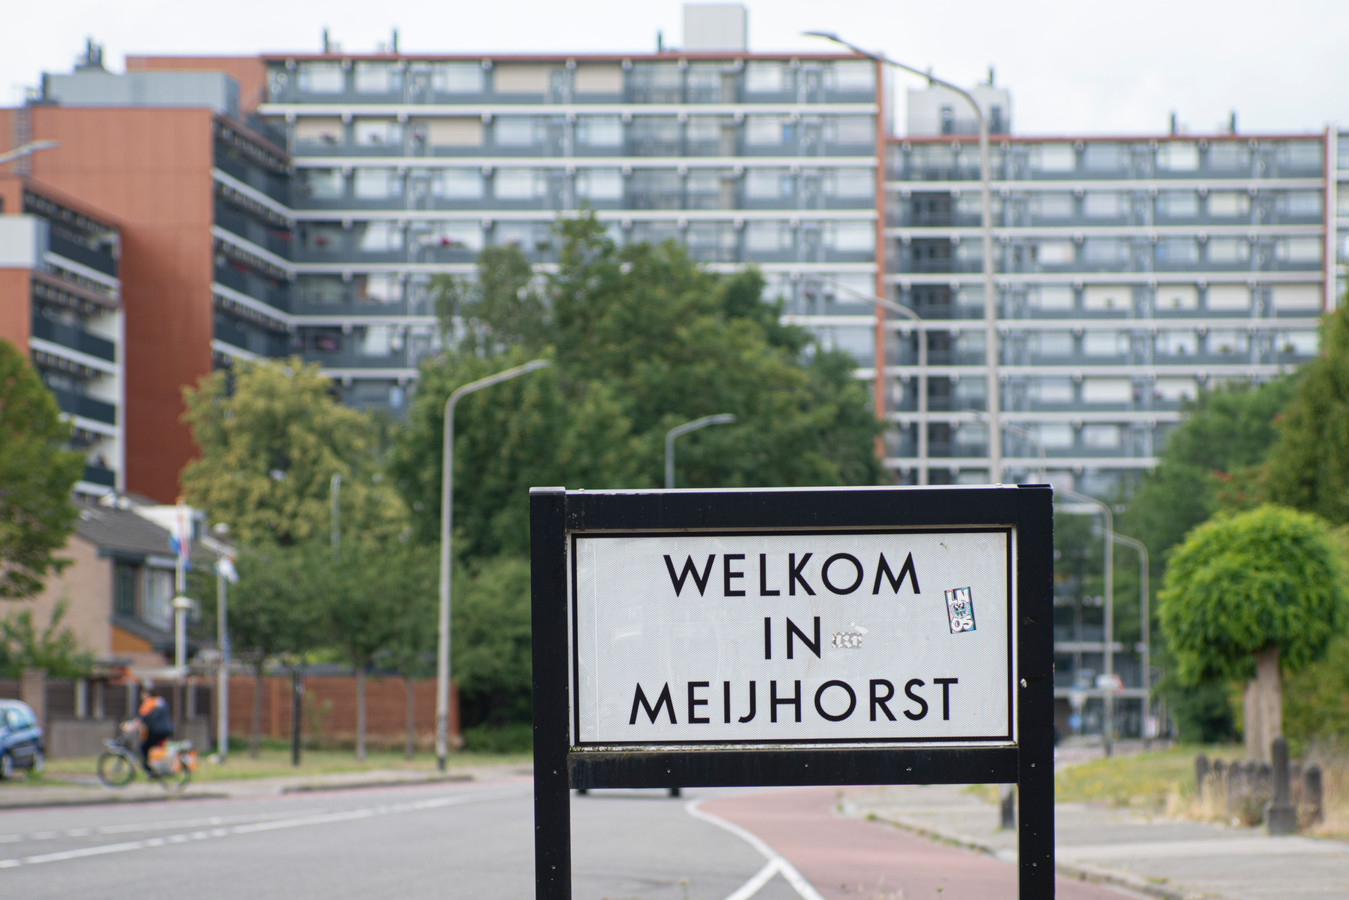 De =60ste straat Meijhorst in Nijmegen.